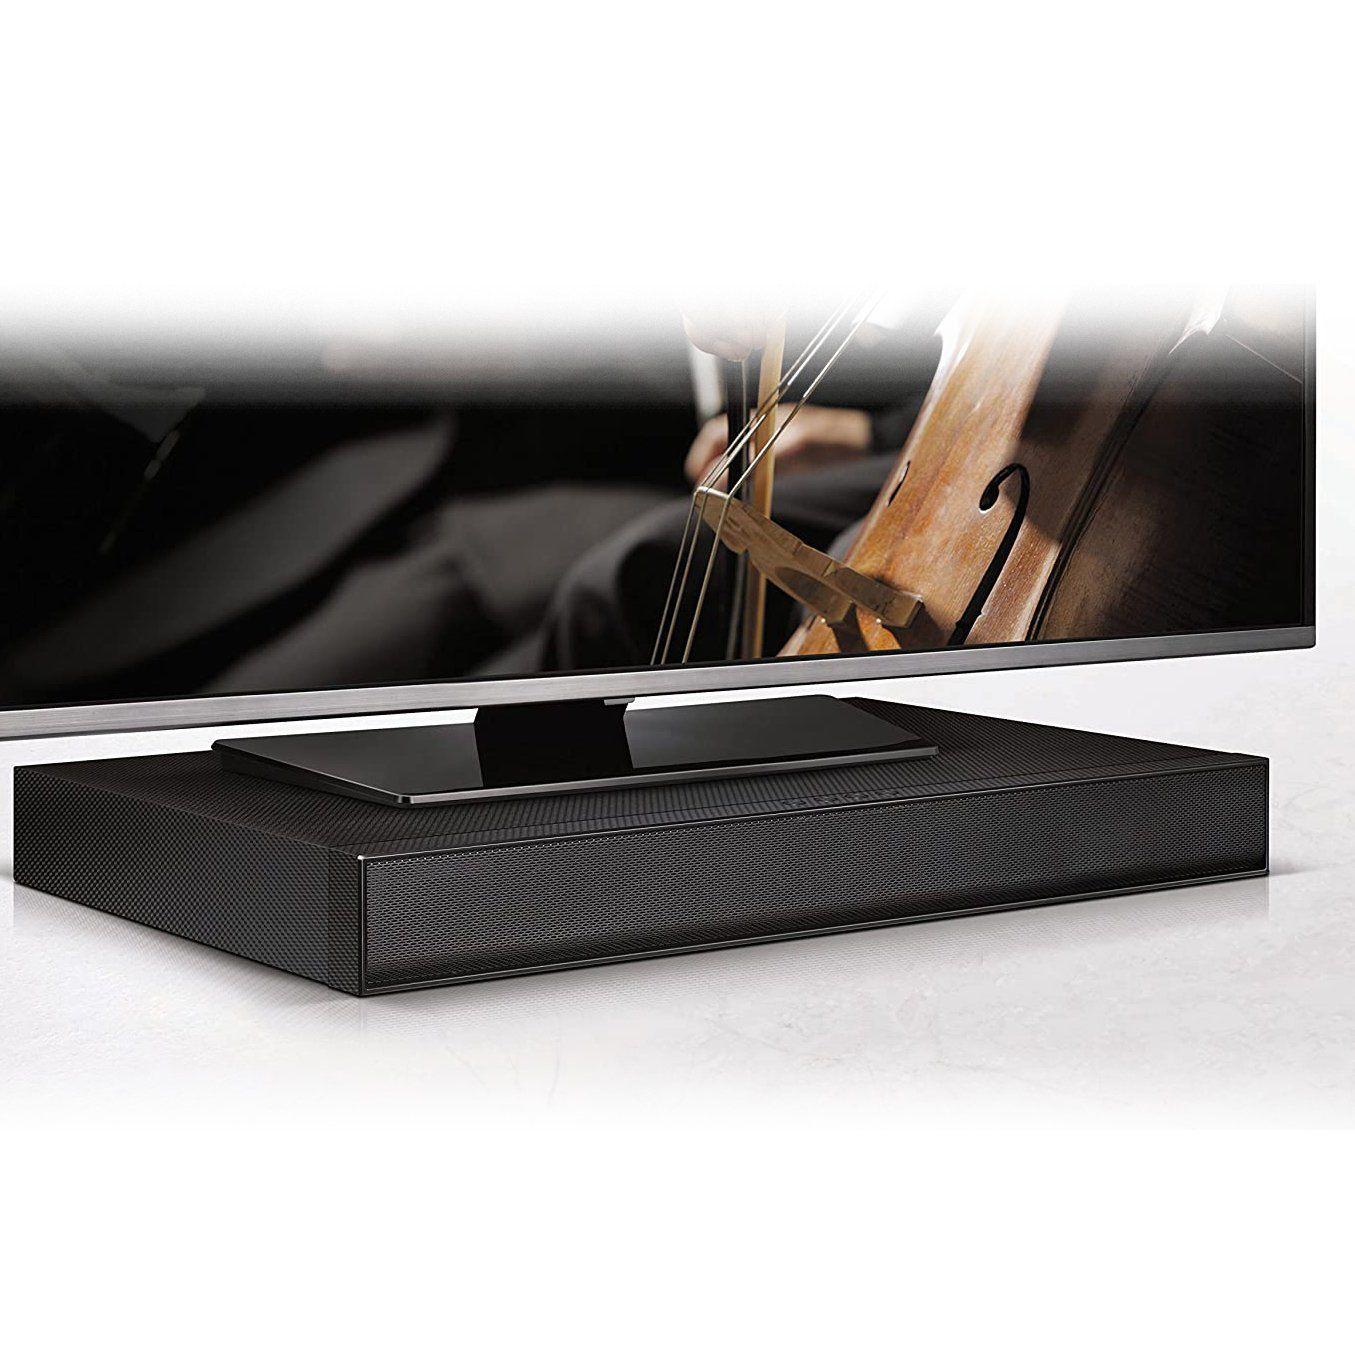 LG Electronics LAP250H Sound Plate